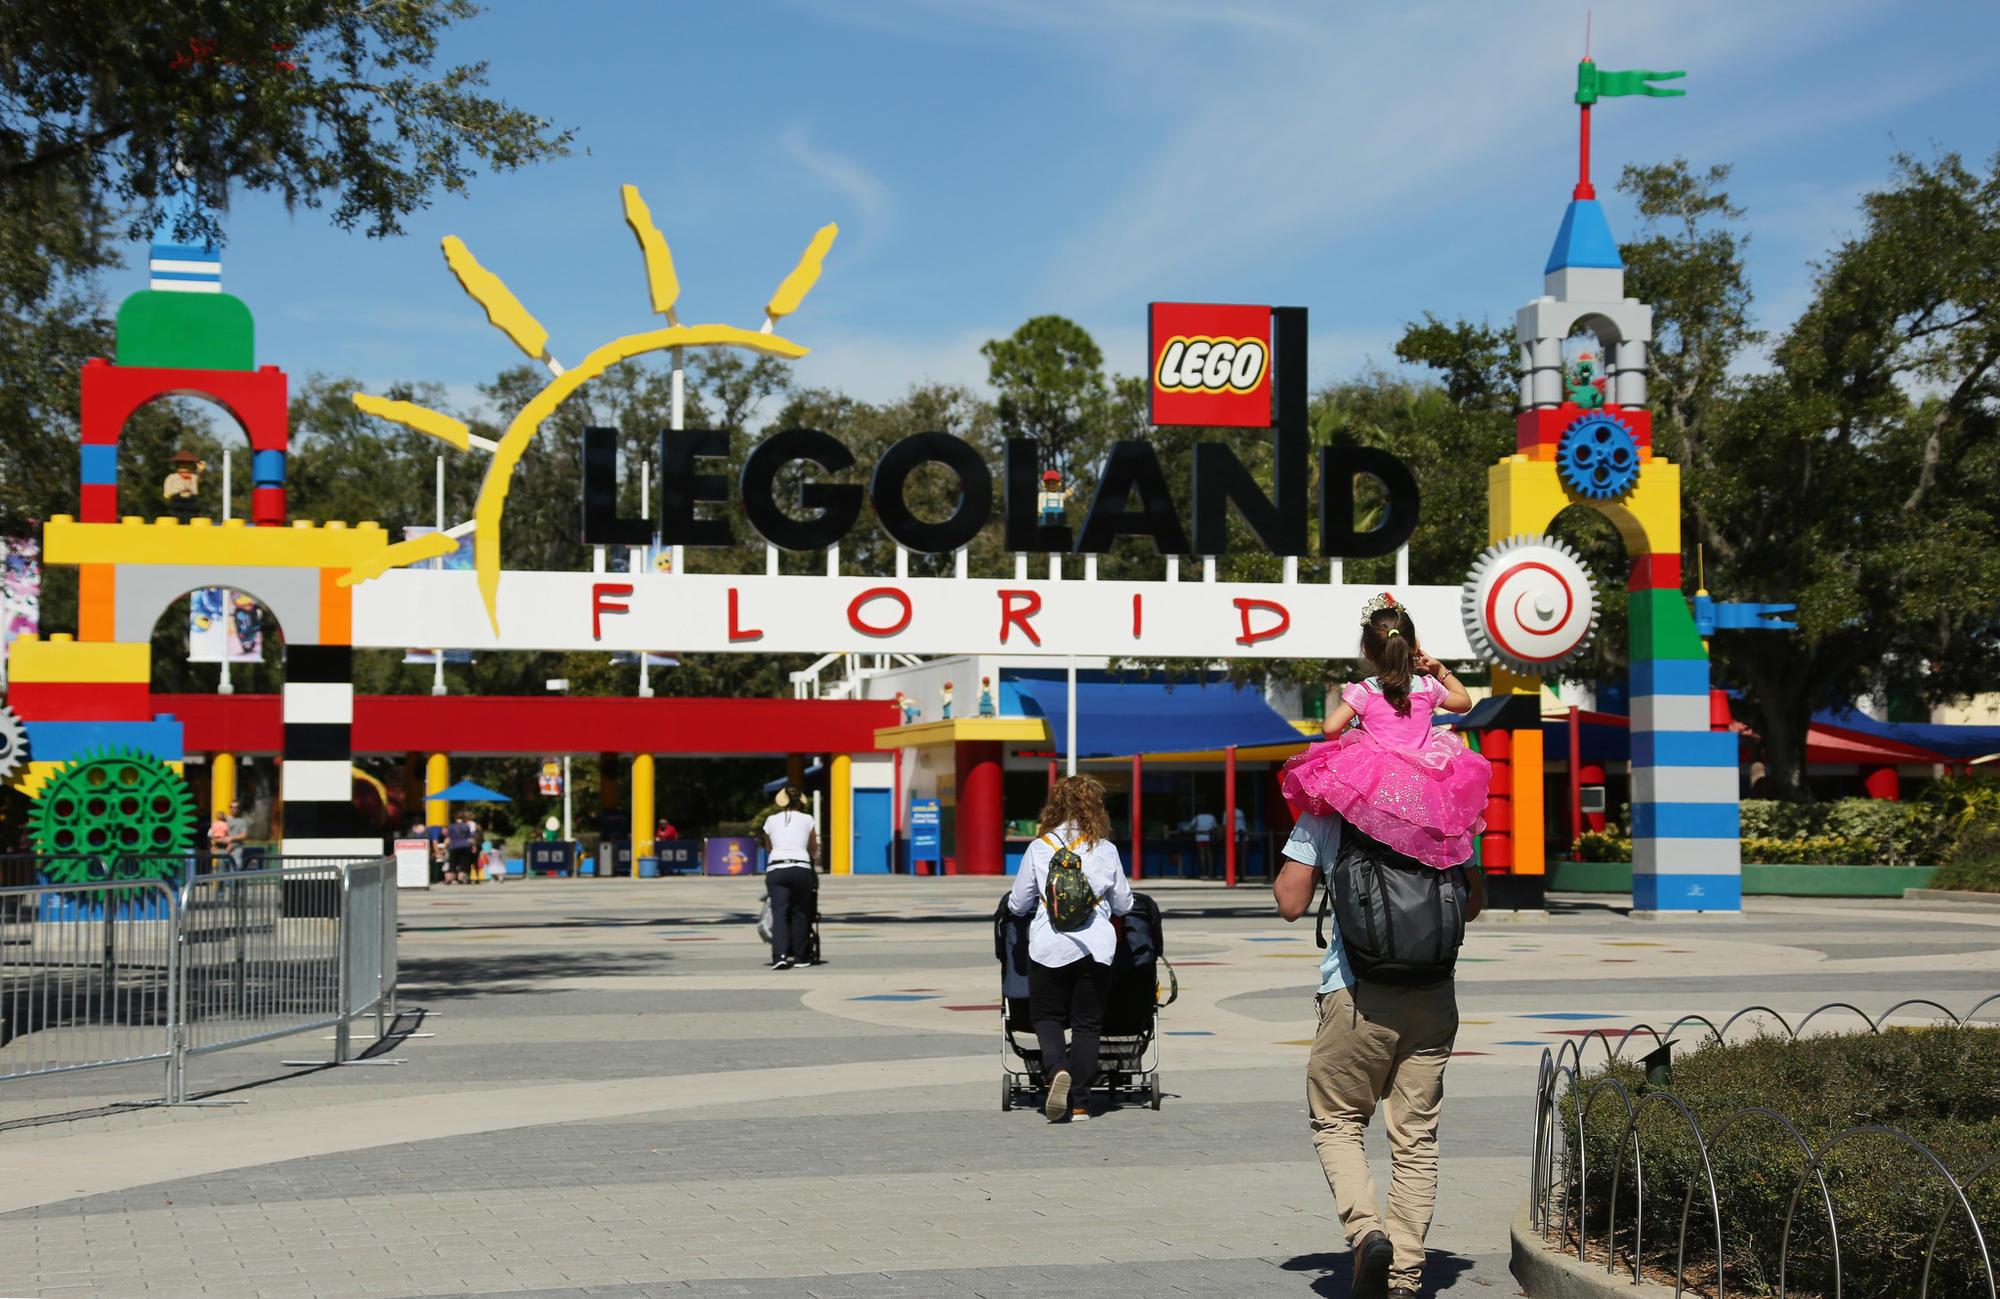 Legoland Florida Resorts Vip Tours Are Built For Families Orlando Sentinel